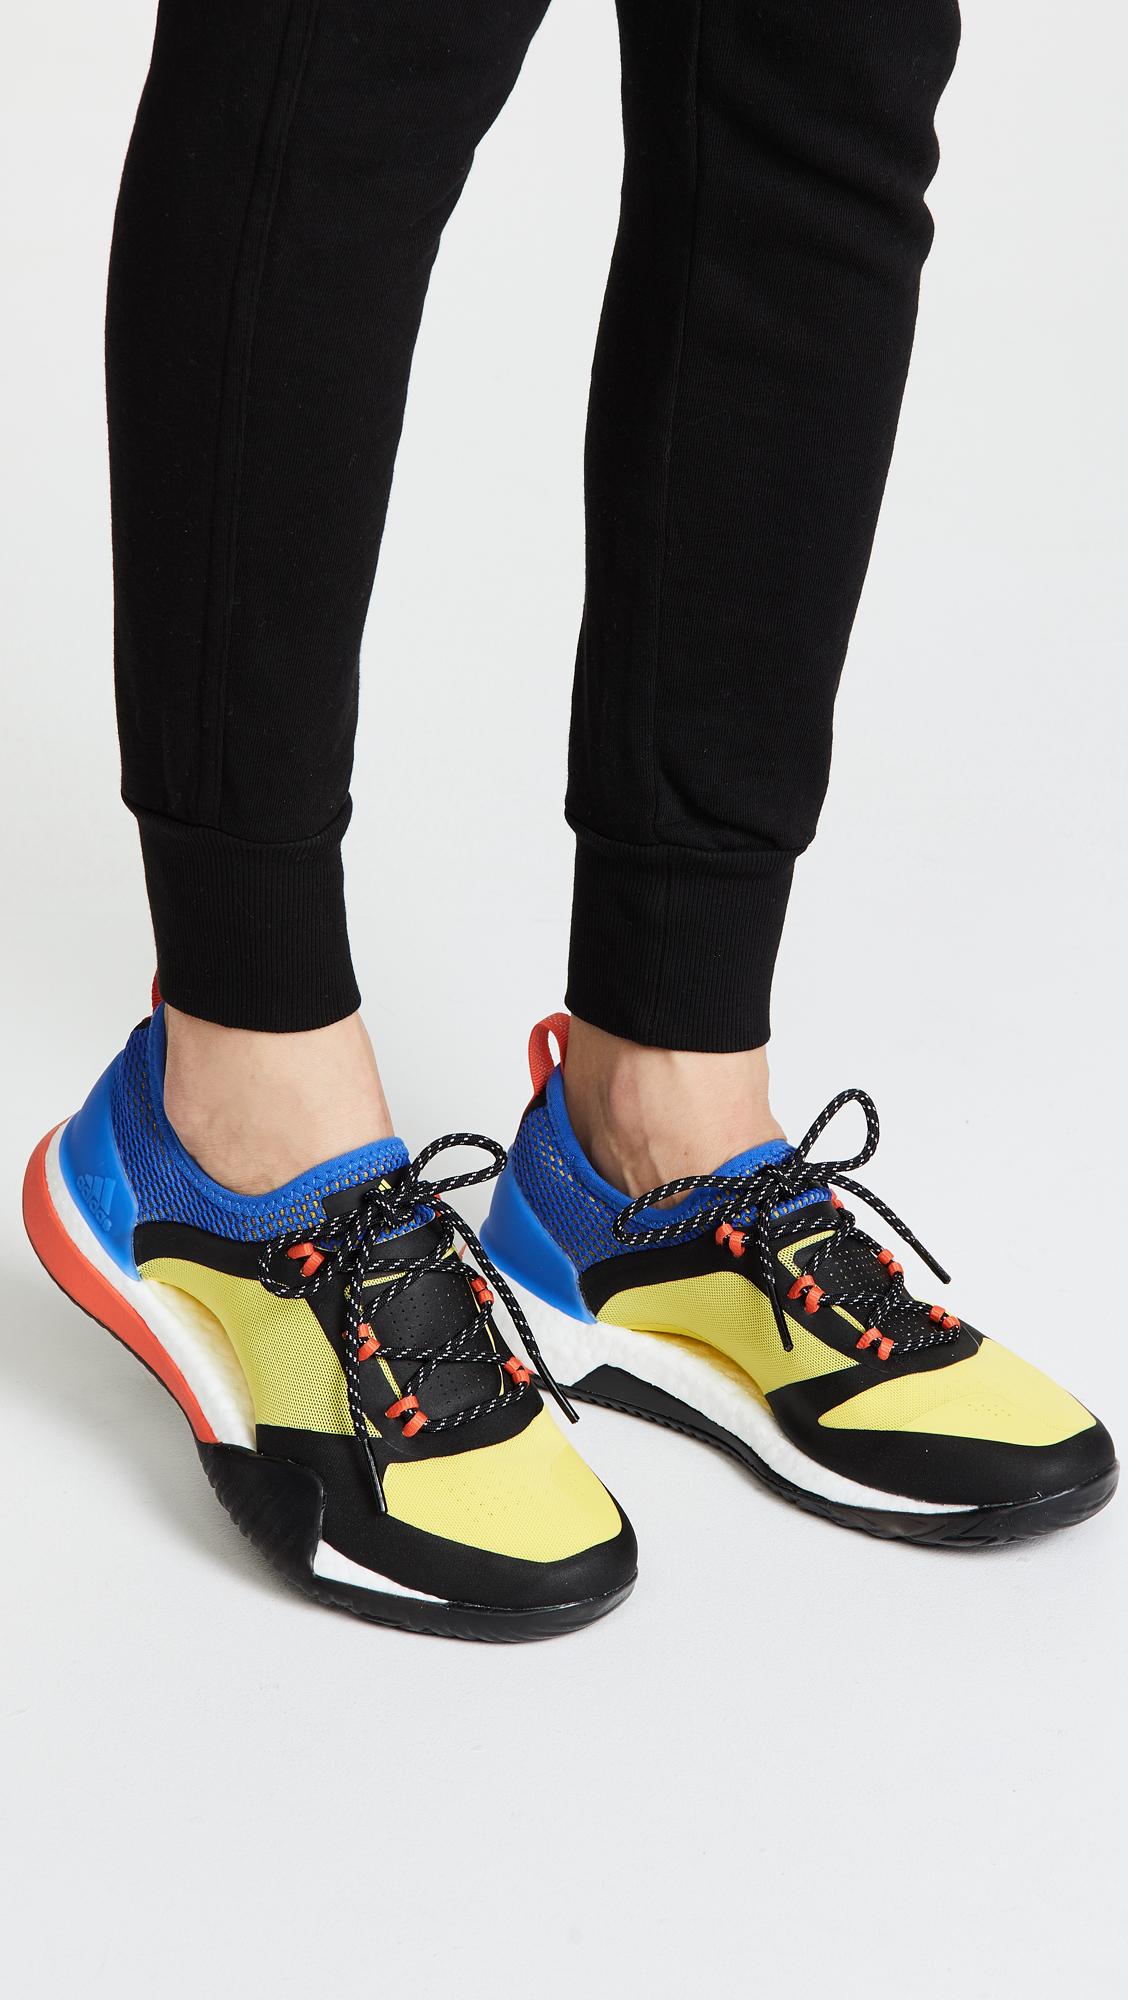 d76911f89cc0d2 adidas by Stella McCartney PureBOOST X TR 3.0 Sneakers